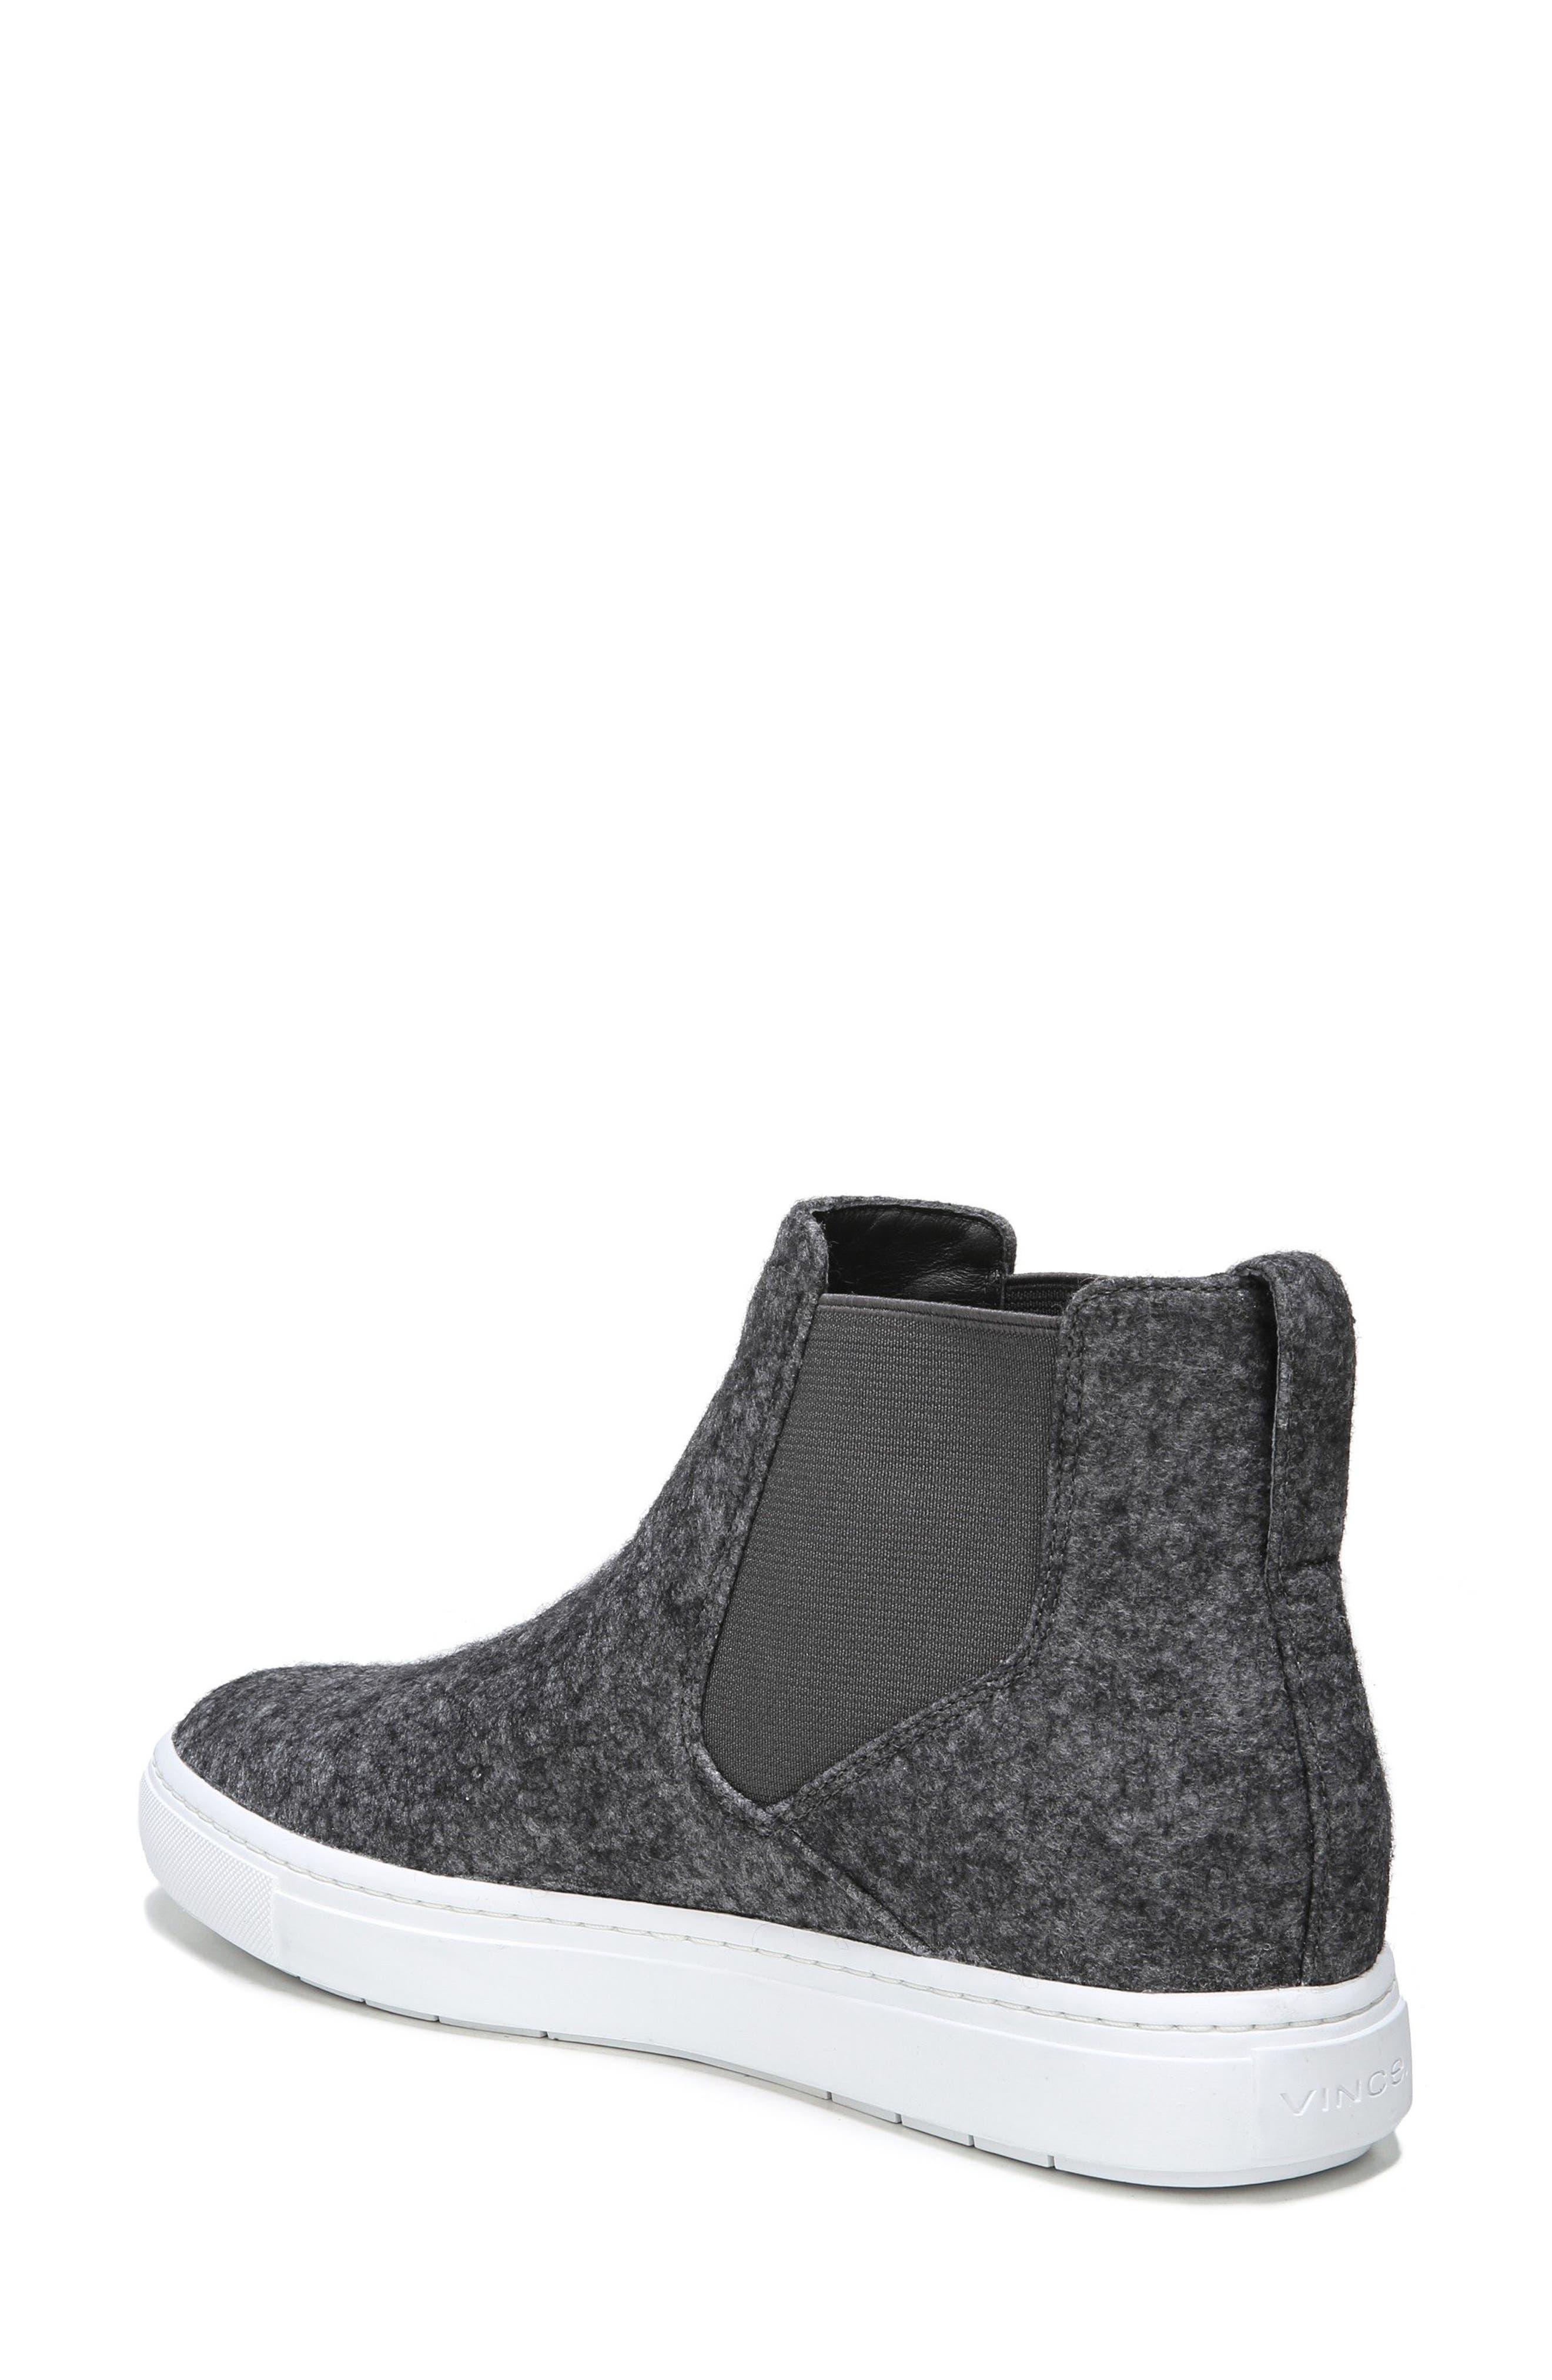 Newlyn High Top Sneaker,                             Alternate thumbnail 13, color,